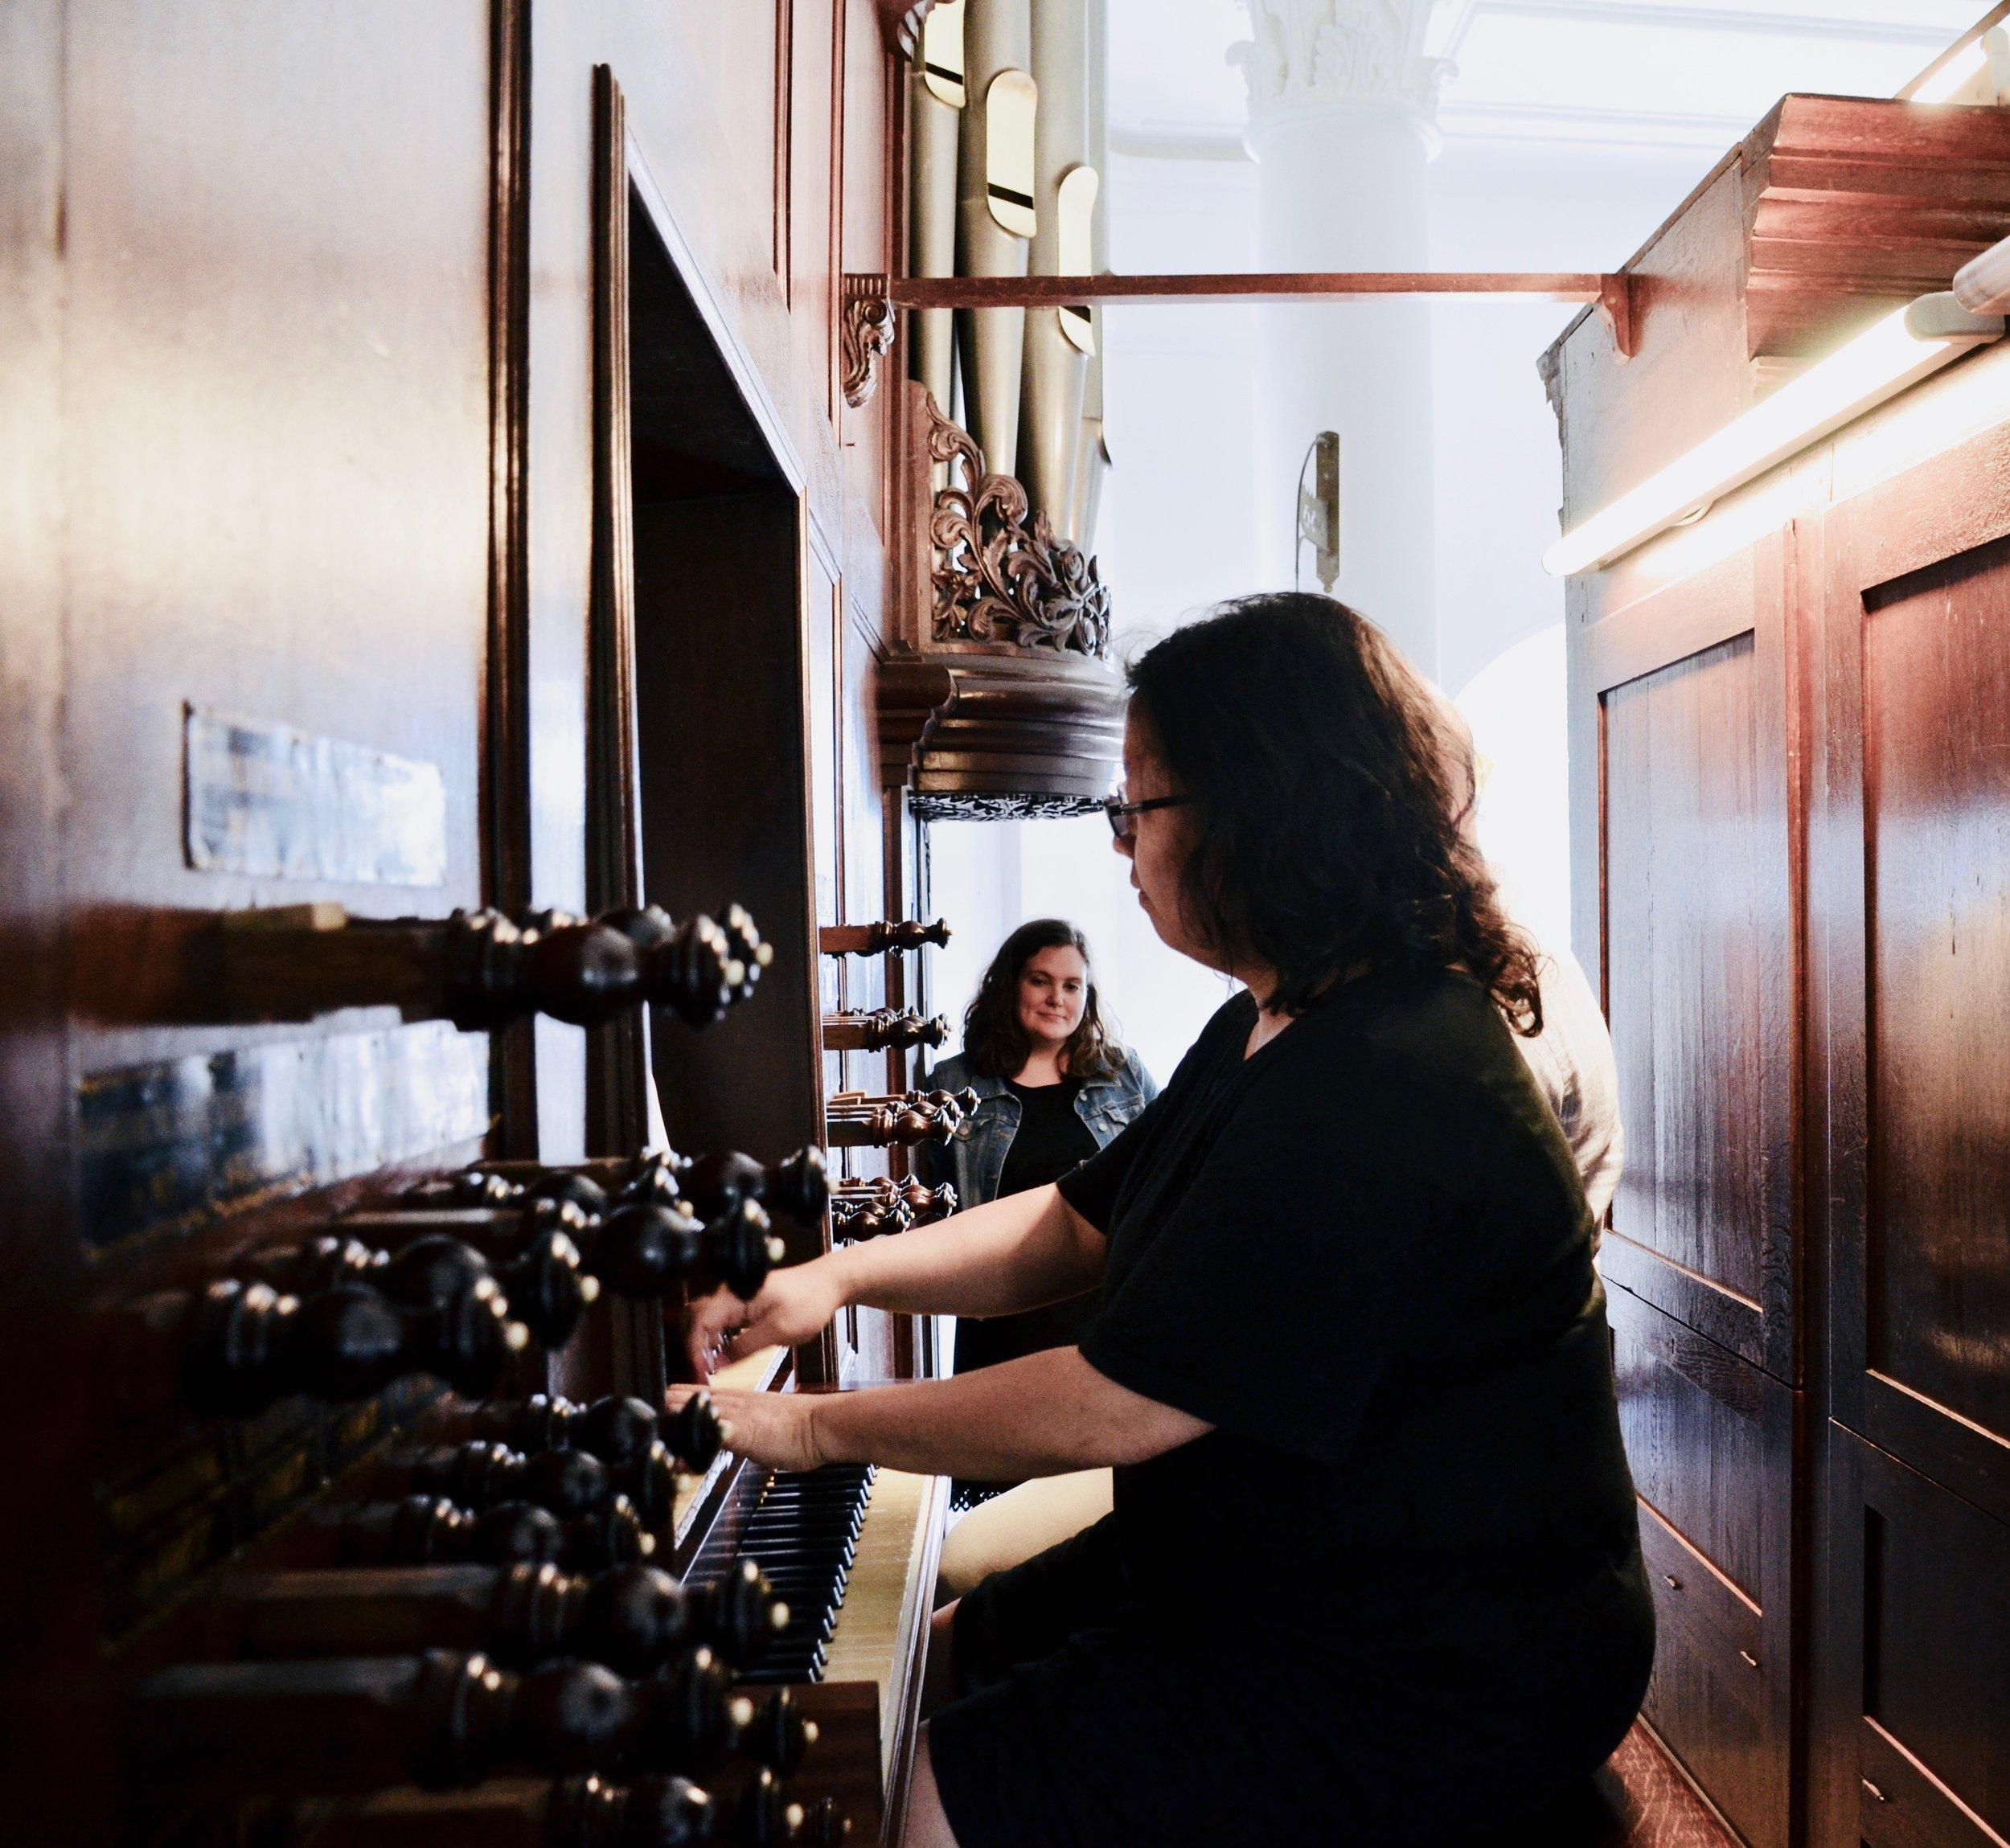 Jennifer Hsiao at the 1823 Lohman organ, Hervormde kerk, Farmsum, Netherlands.